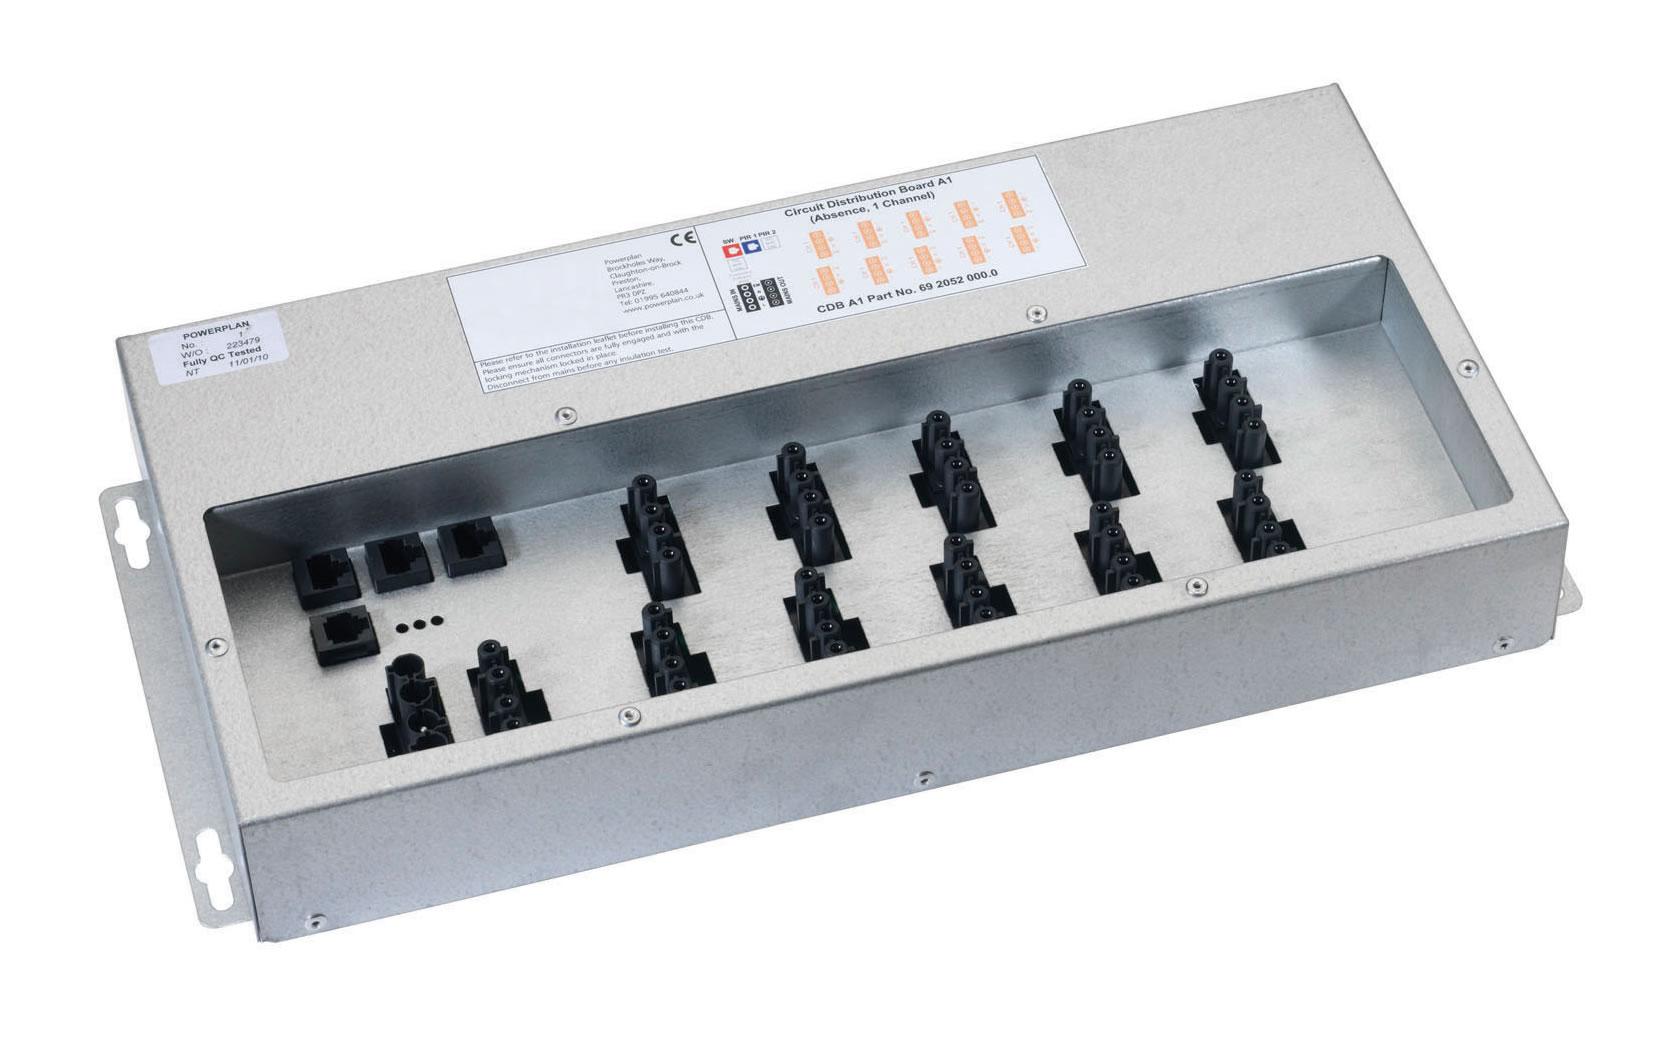 Rigel Circuit Distribution Box (CDB)